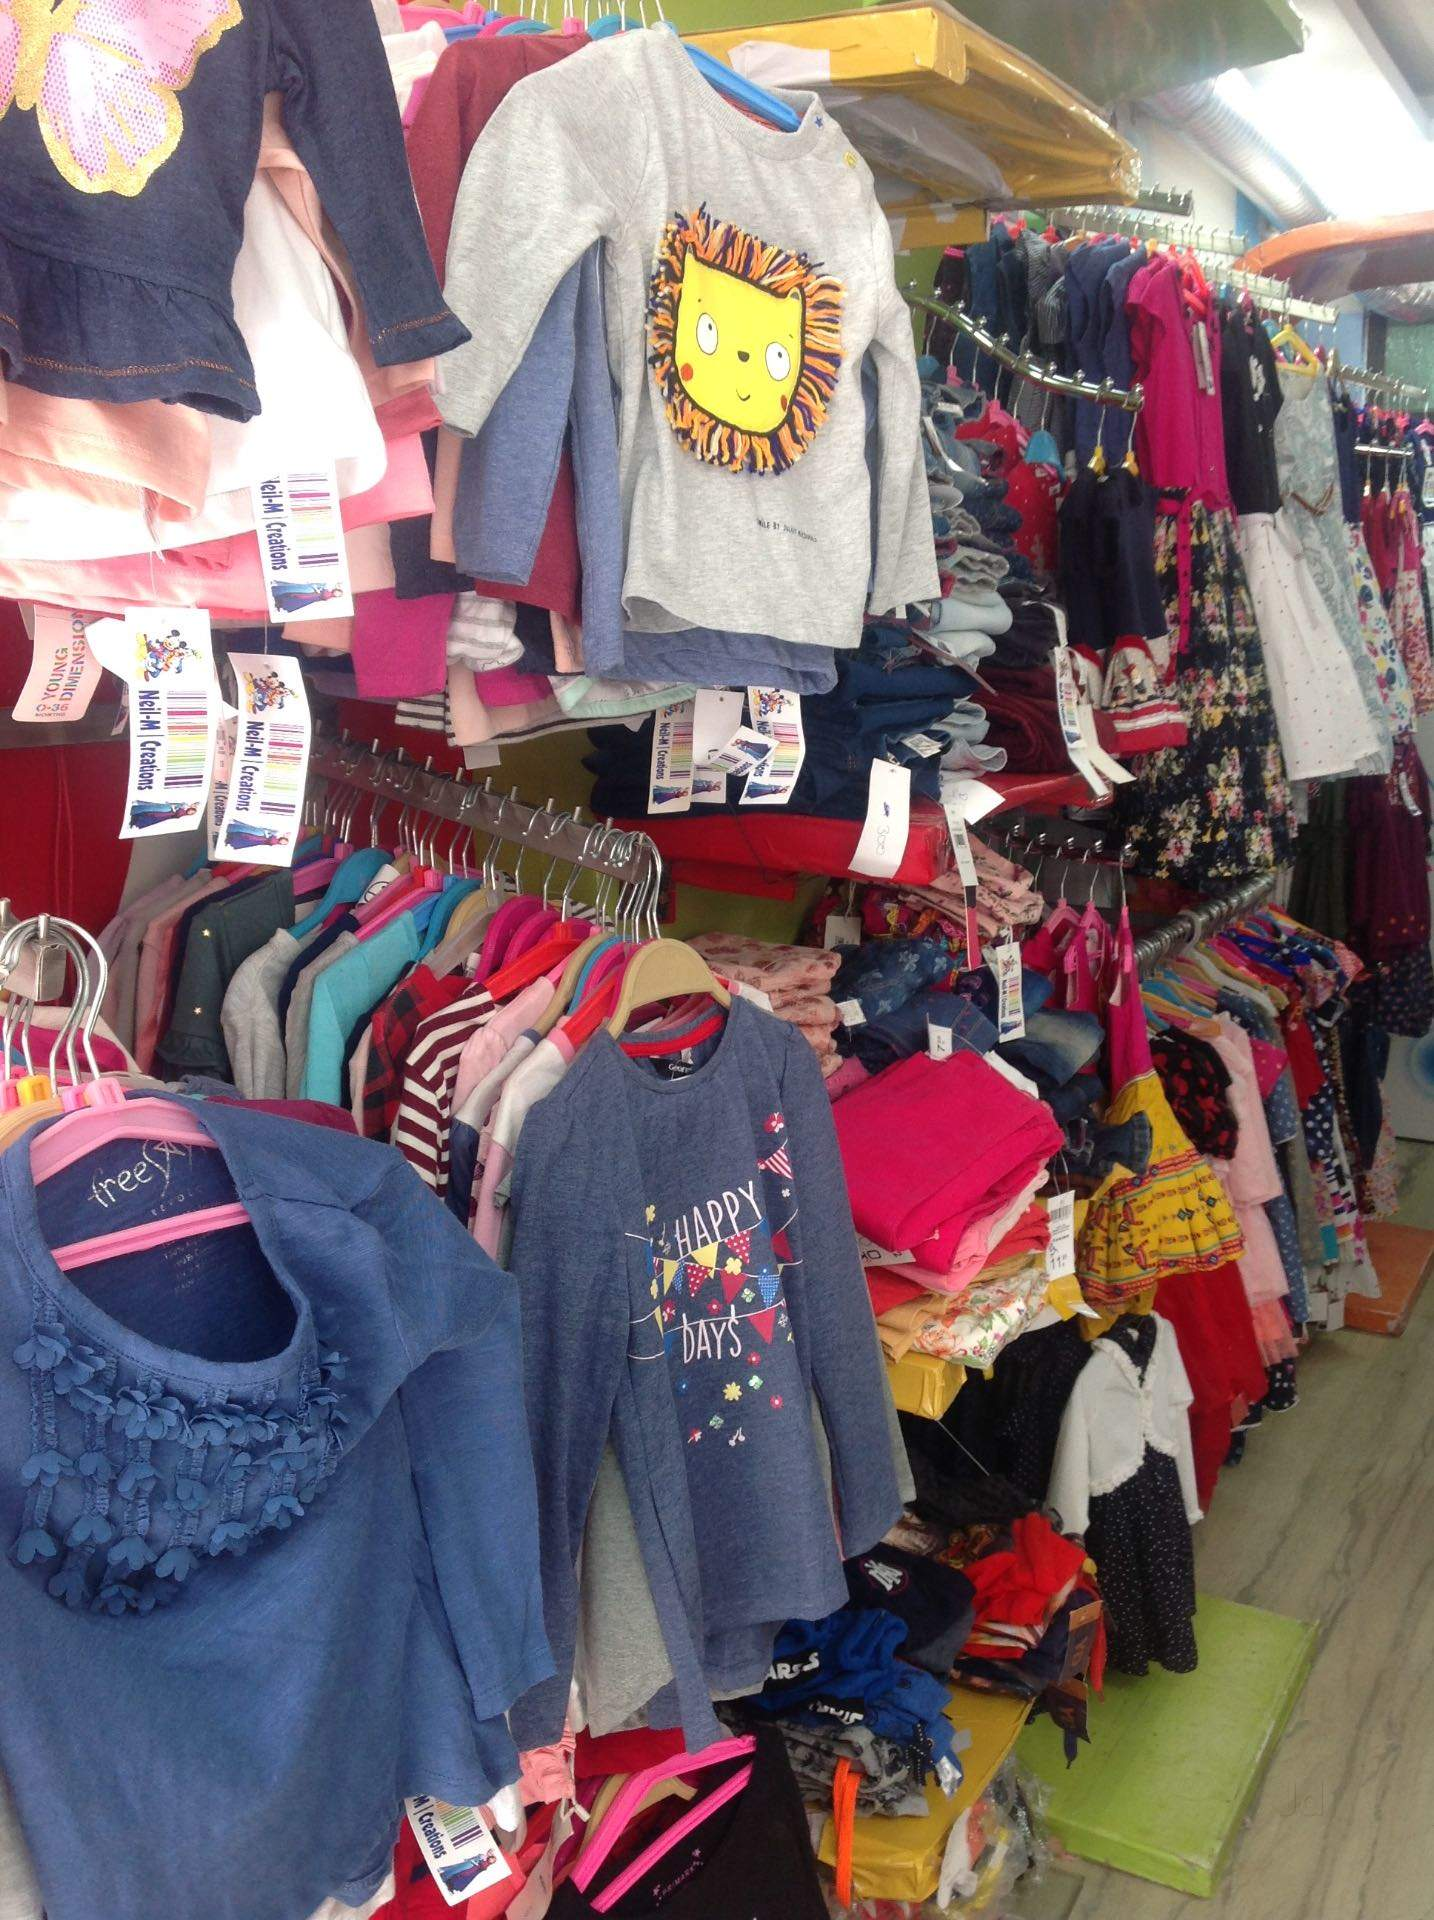 457a2627bf80 Top 100 Children Readymade Garment Wholesalers in Delhi - Best Kids ...